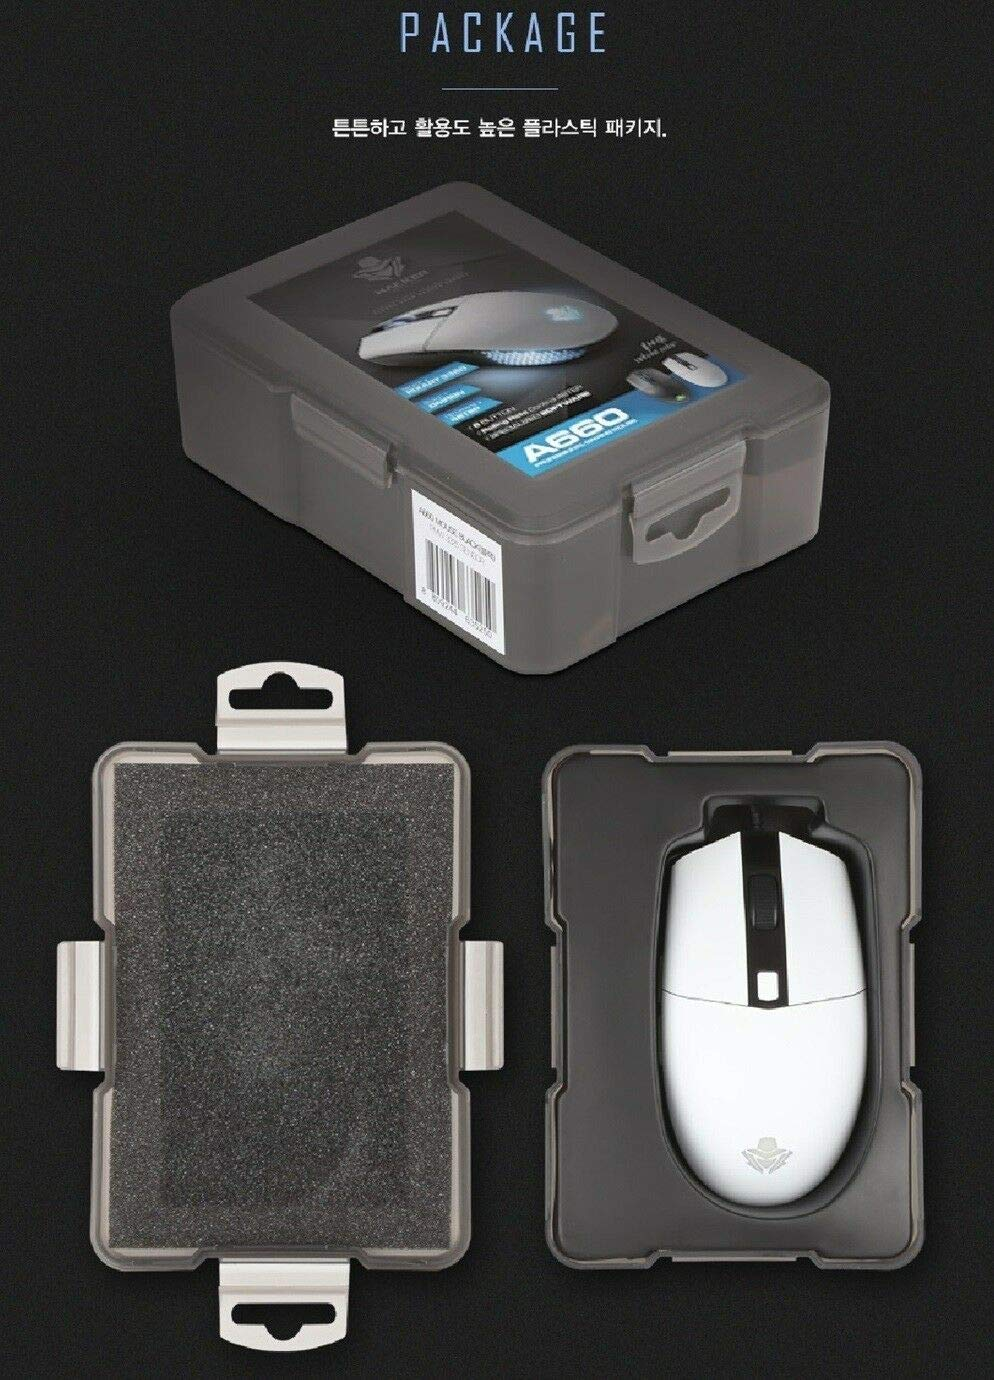 ABKO HACKER A660 3360 Gaming Mouse White PMW3360